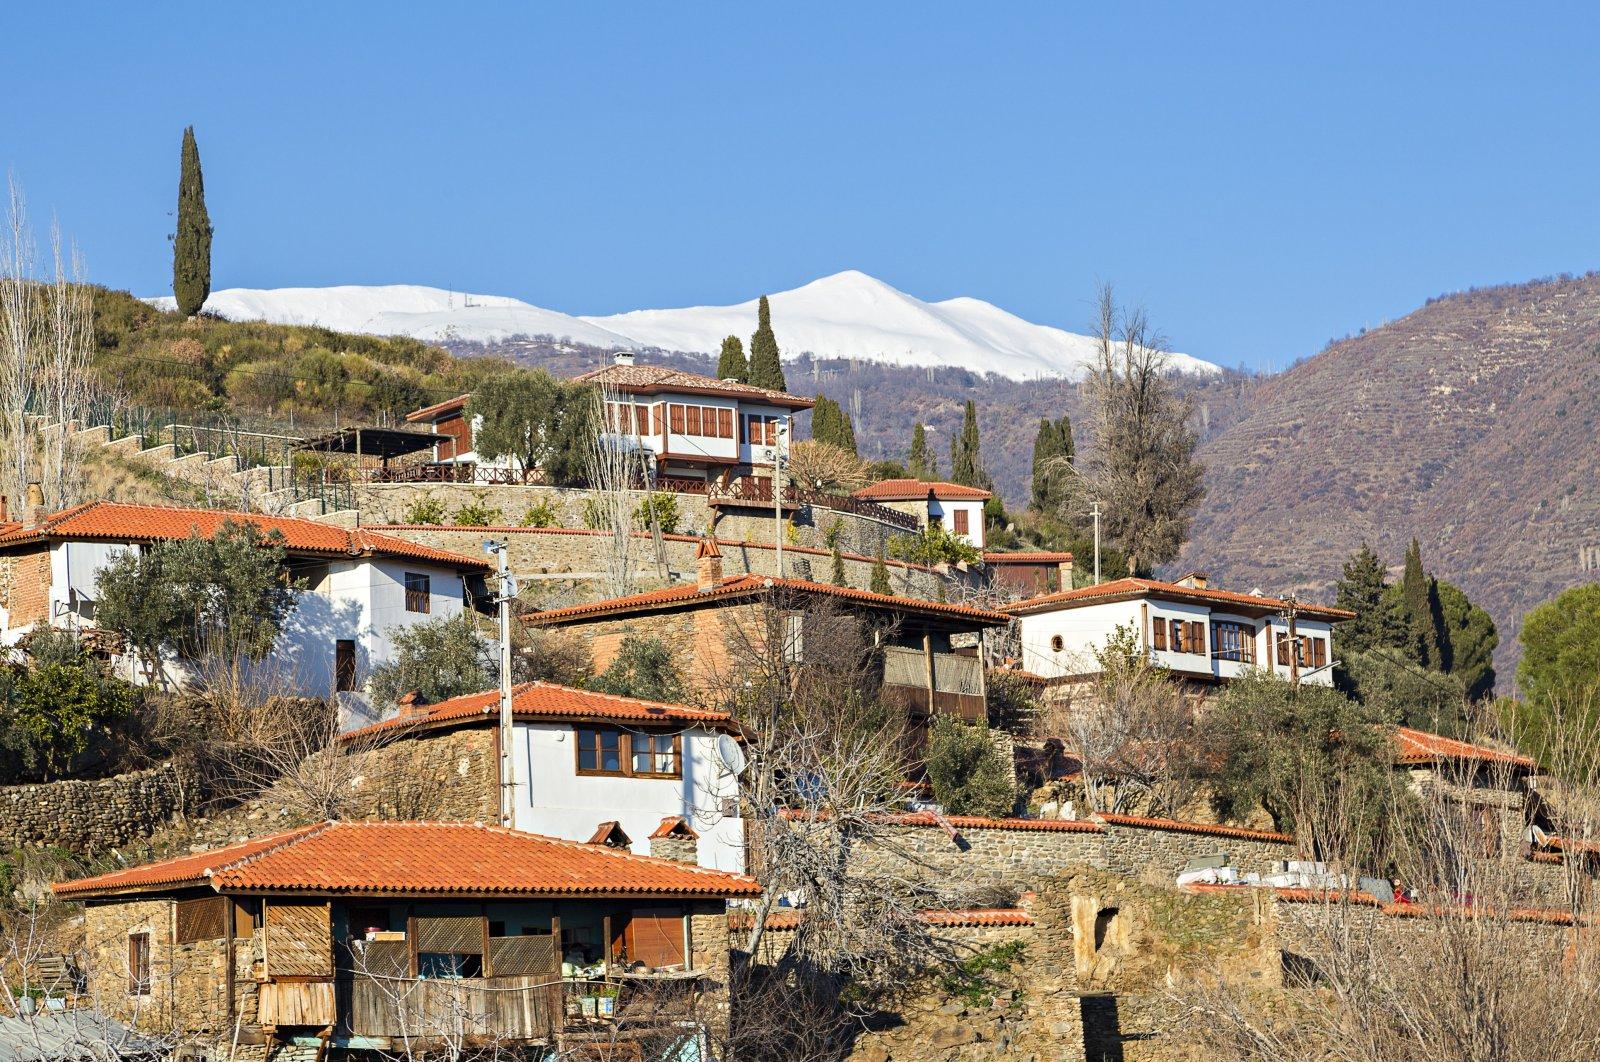 A general view of the Birgi neighborhood, İzmir province, western Turkey.